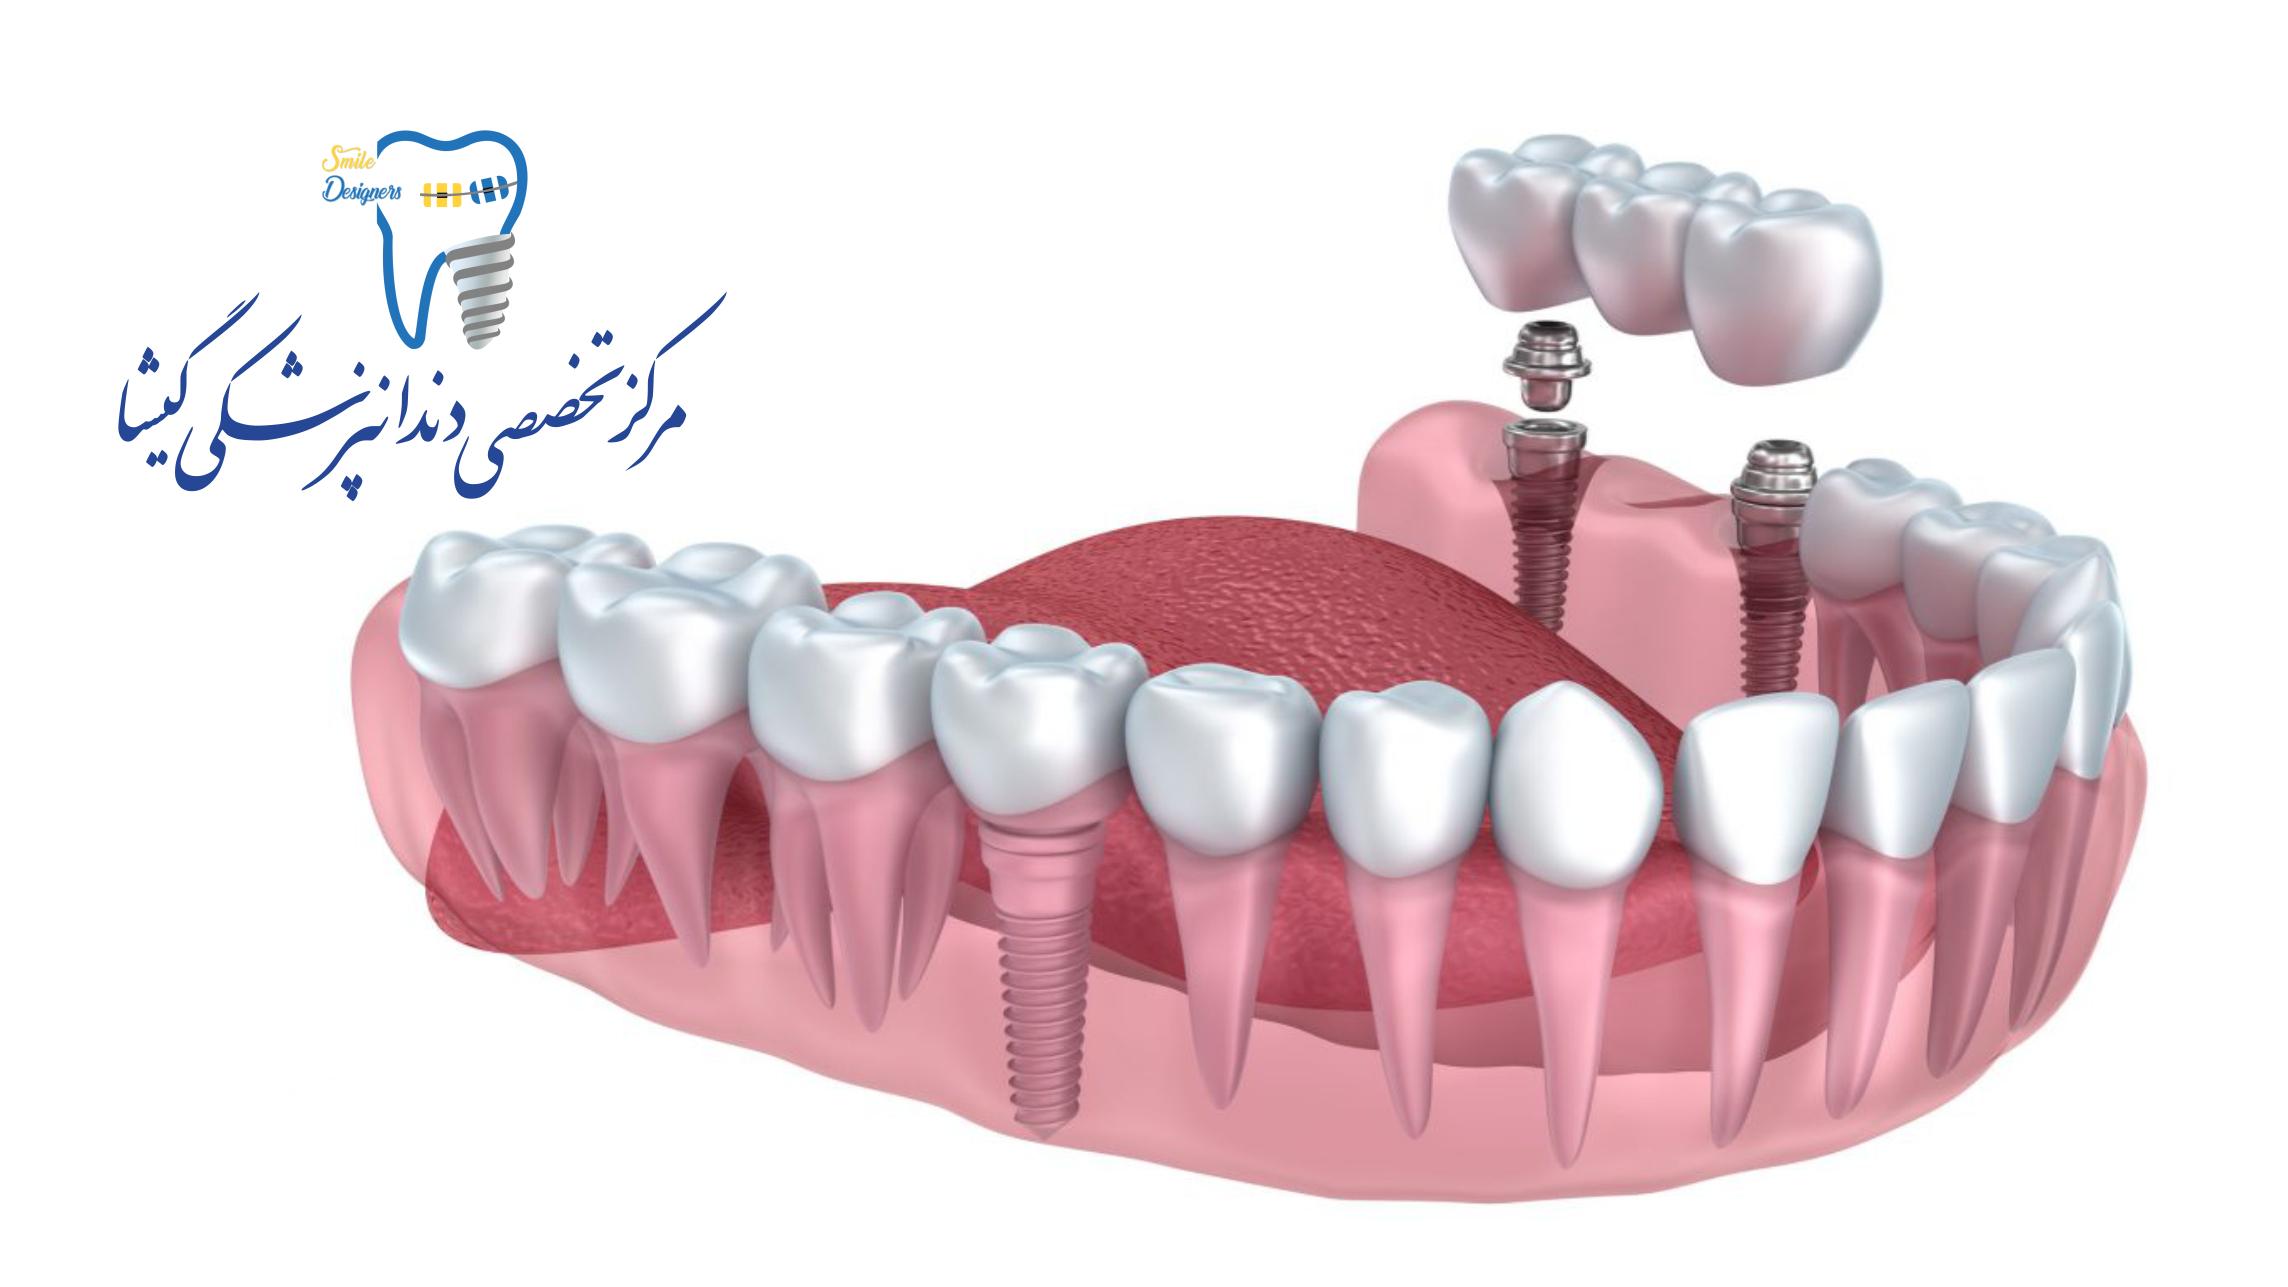 ایمپلنت دندان به صورت قسطی در کلینیک دندانپزشکی گیشا